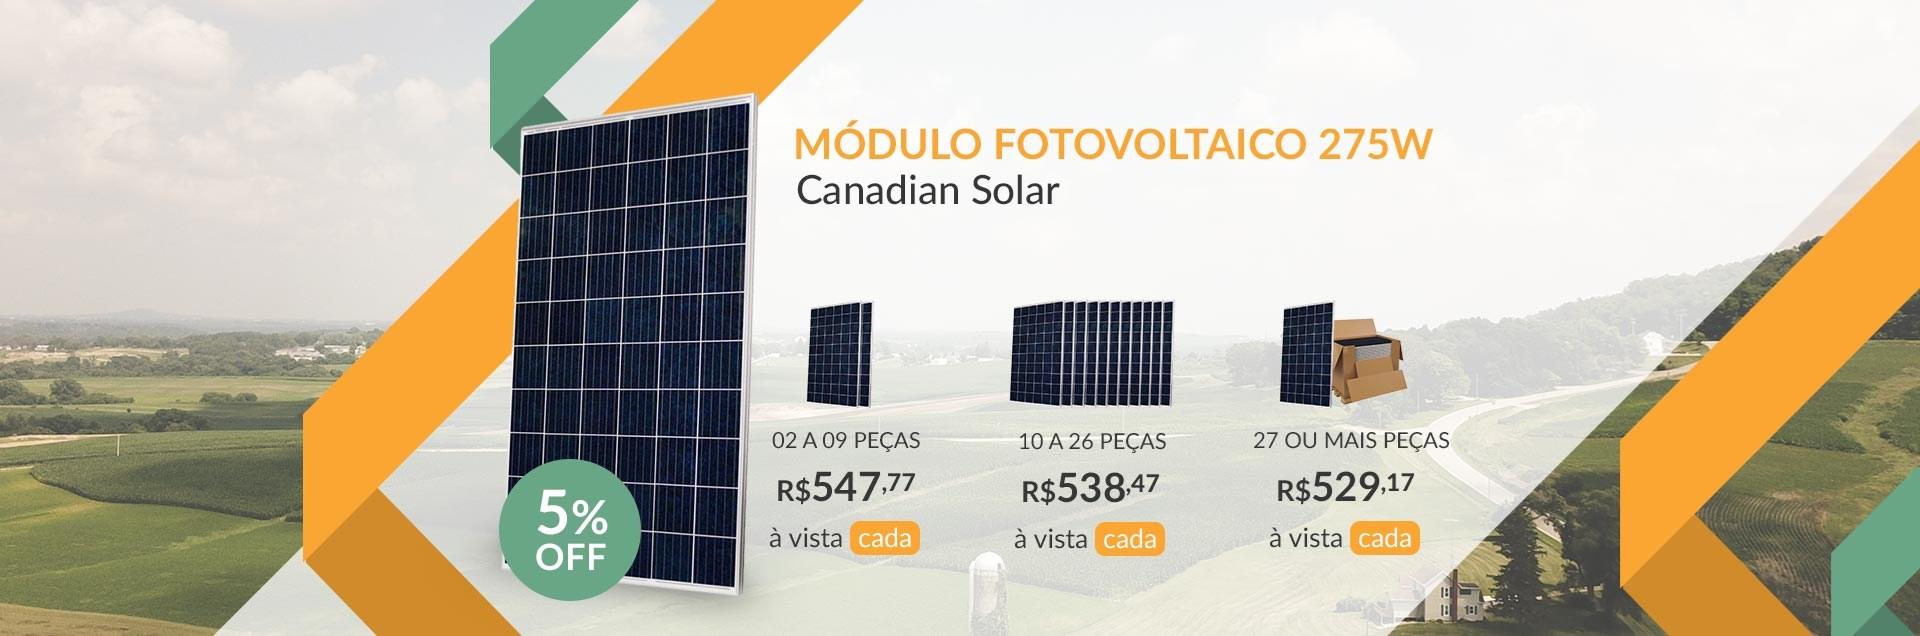 Módulo Fotovoltaico 275W Canadian Solar